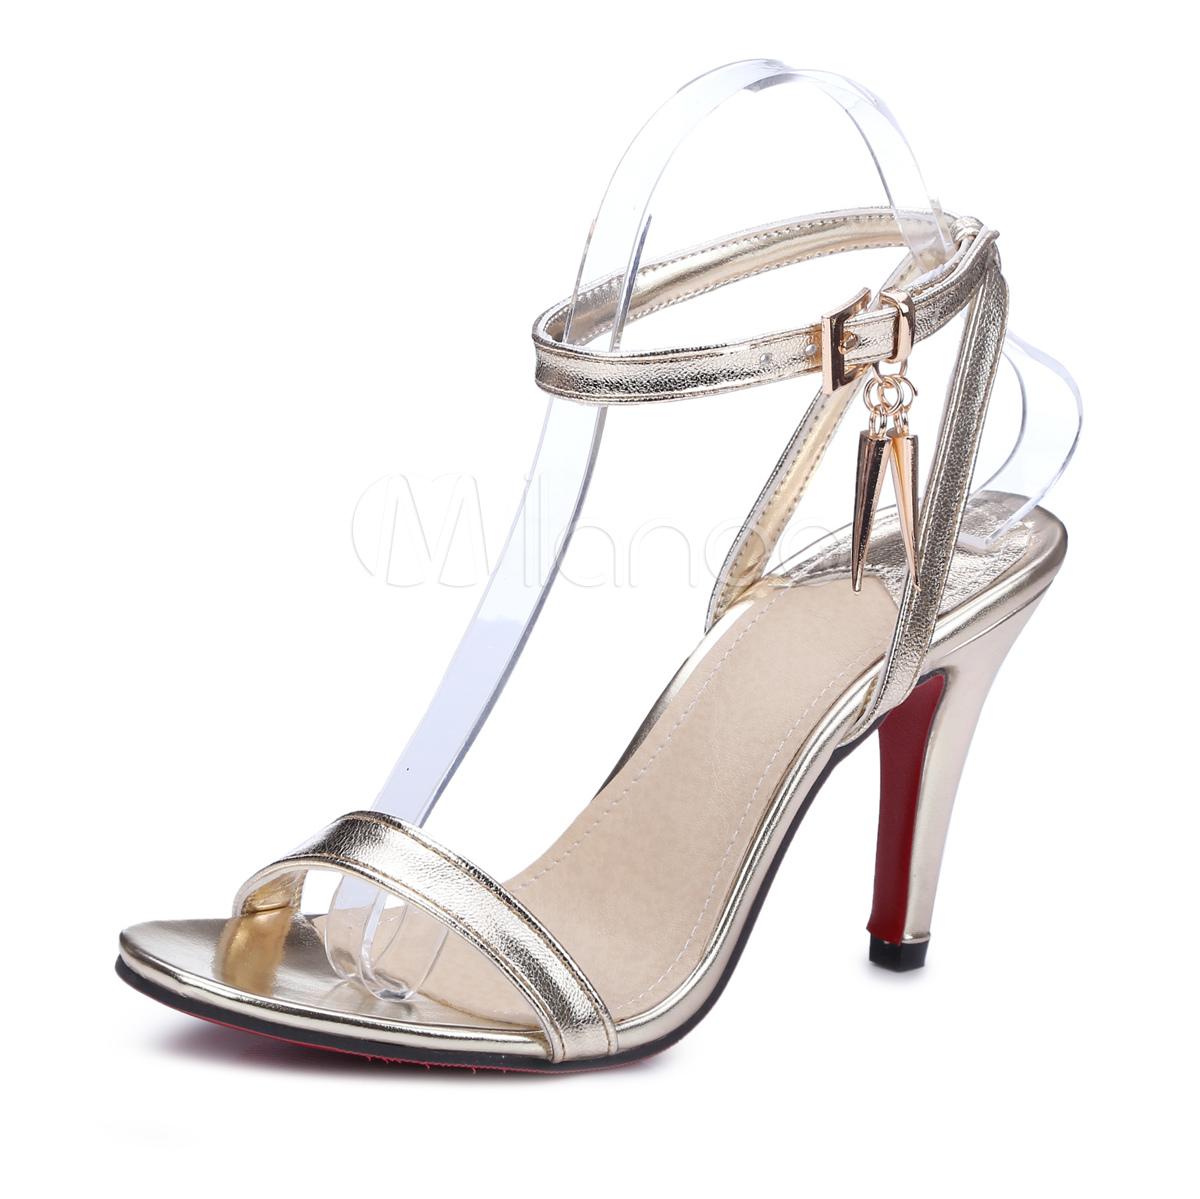 Buy High Heel Sandals Golden Open Toe Stiletto Ankle Strap Sandal Shoes For Women for $28.49 in Milanoo store